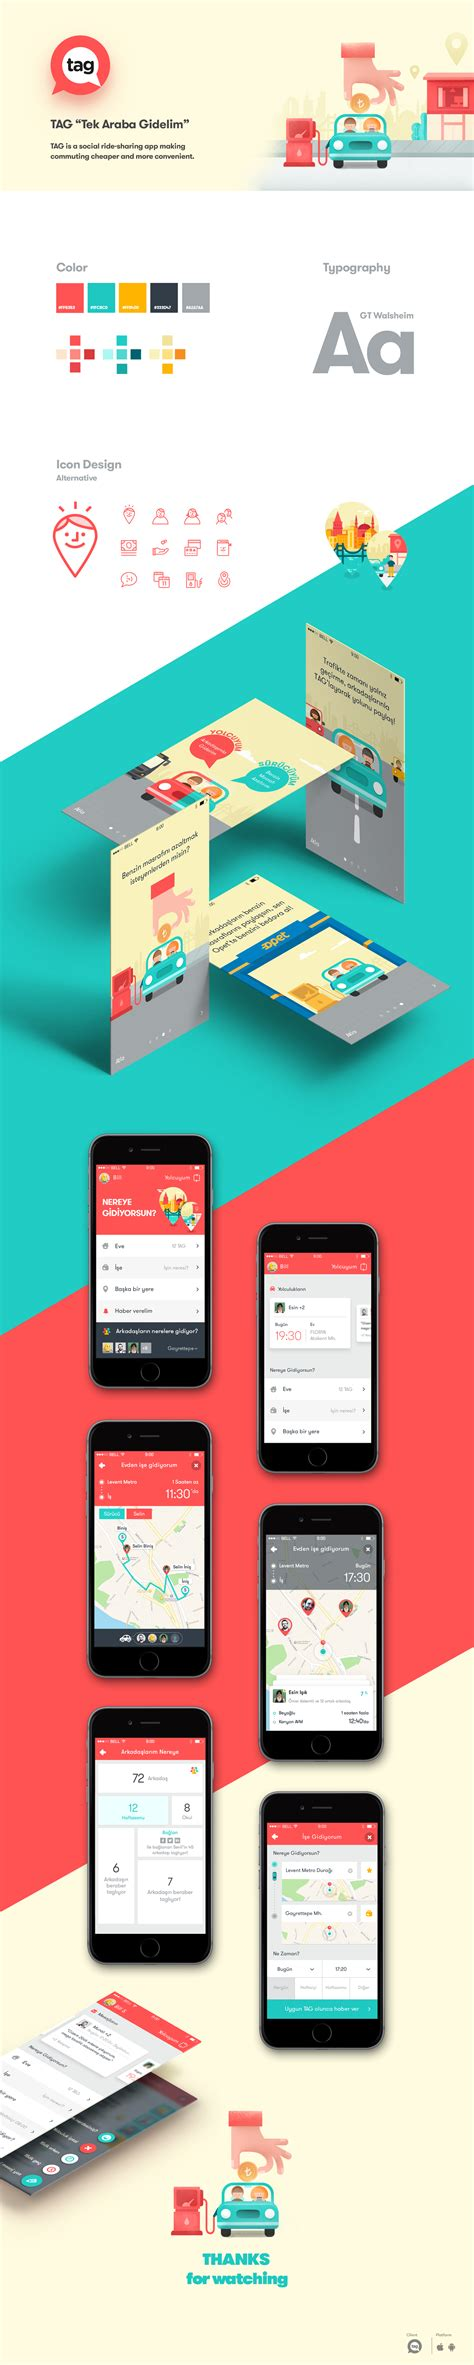 app design on behance quot tag quot mobile app design on behance